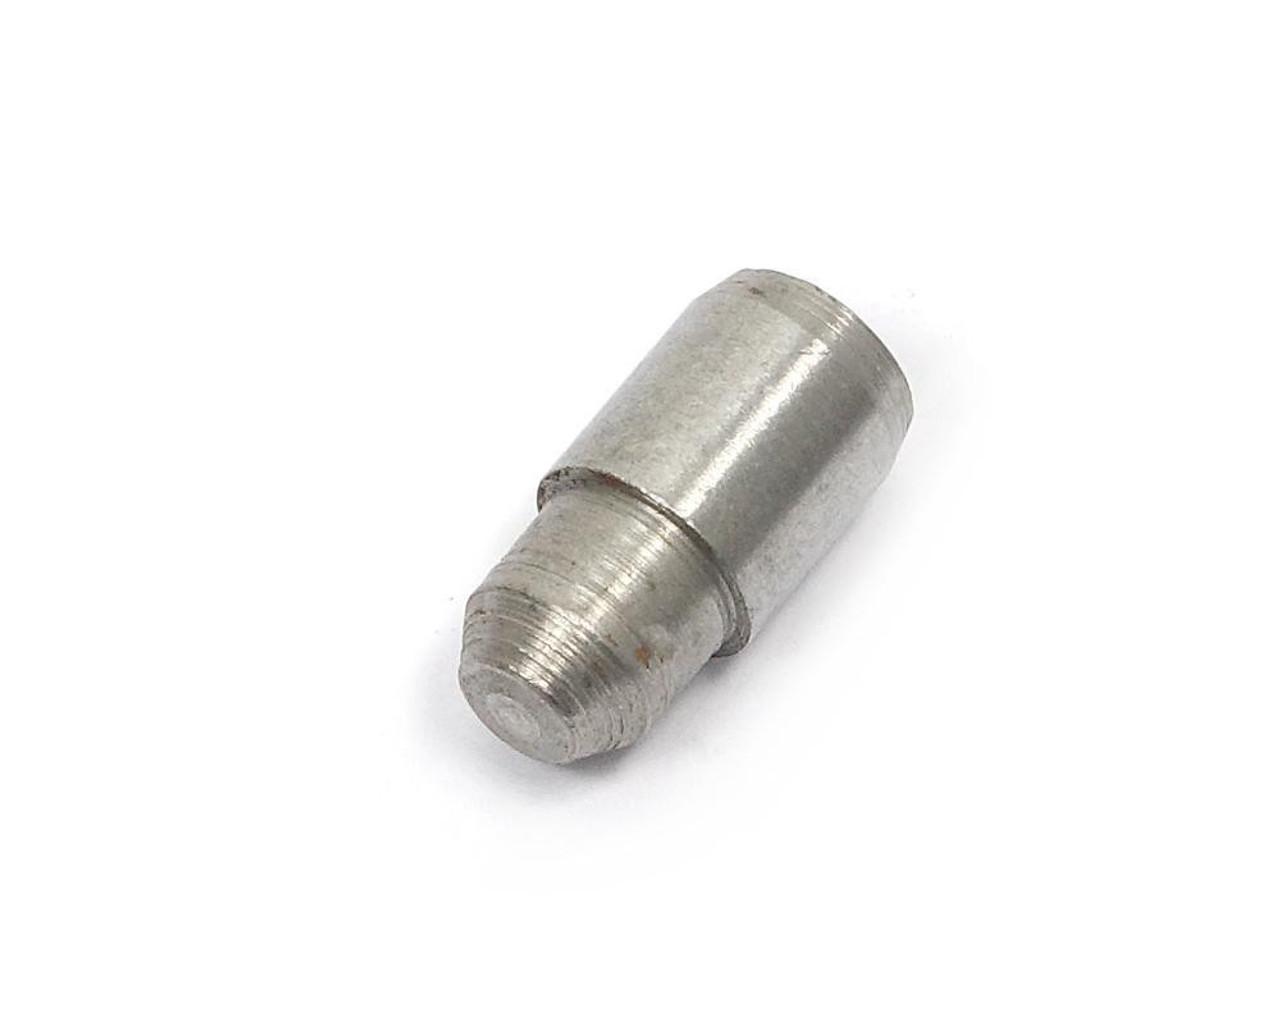 Flywheel Dowel Pin